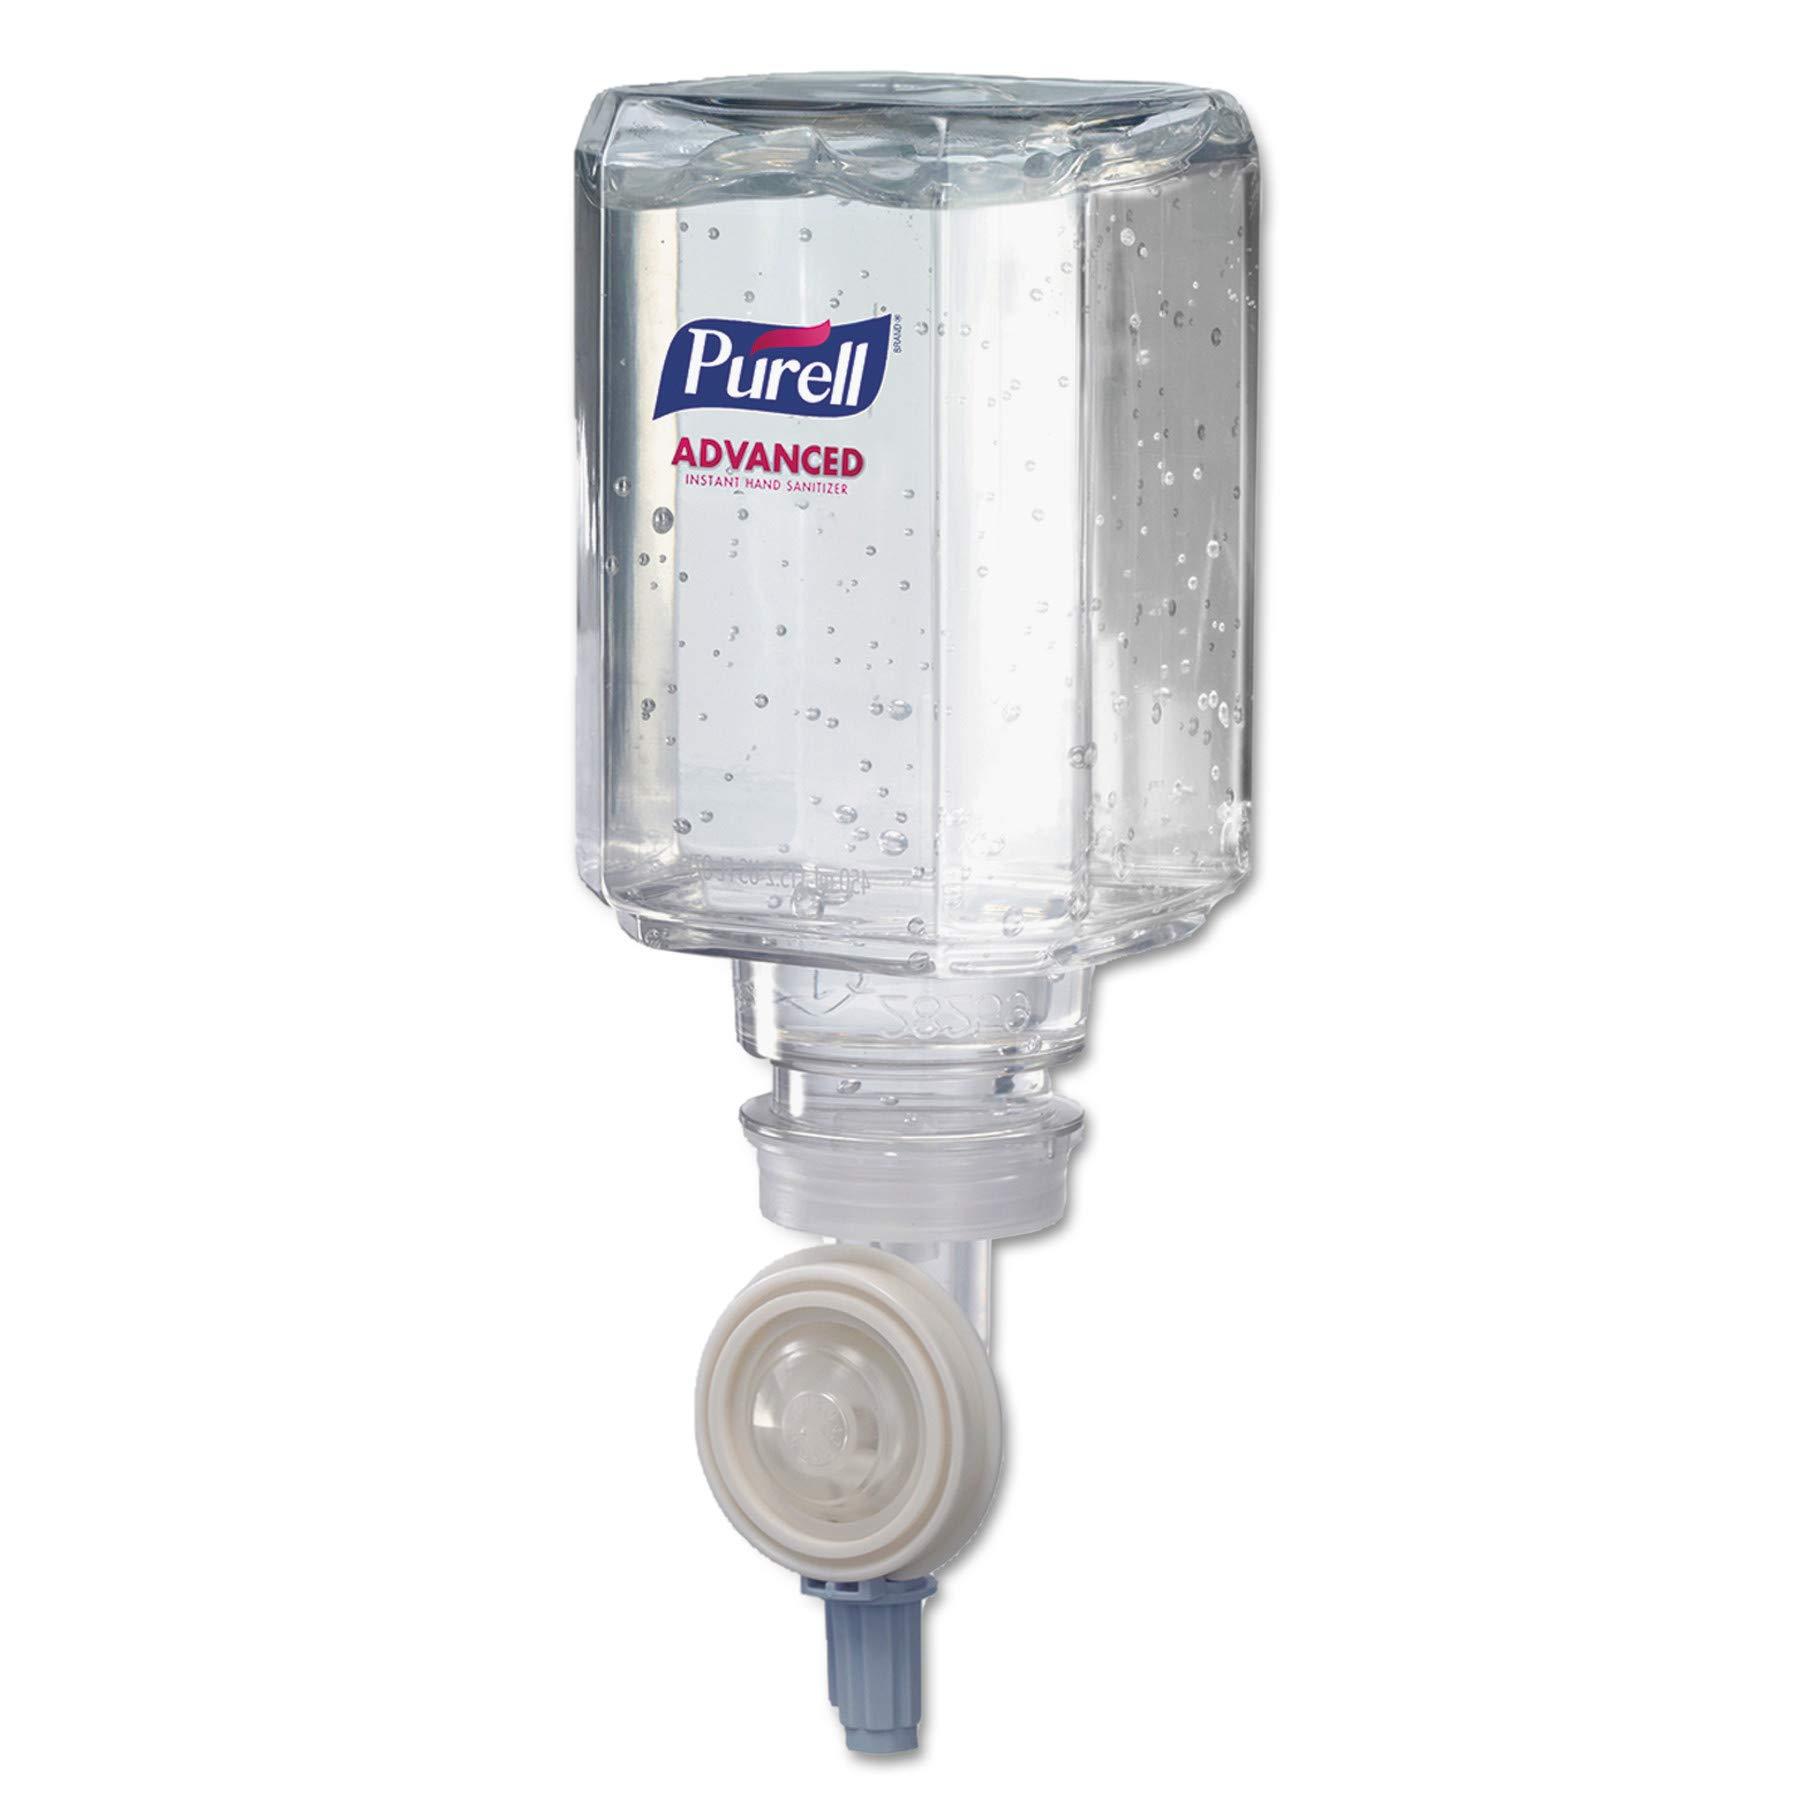 PURELL 1450082CT Advanced Instant Hand Sanitizer Gel, Lemon Scent, 450 mL Refill, 2 Refills per Pack (Case of 8 Packs)